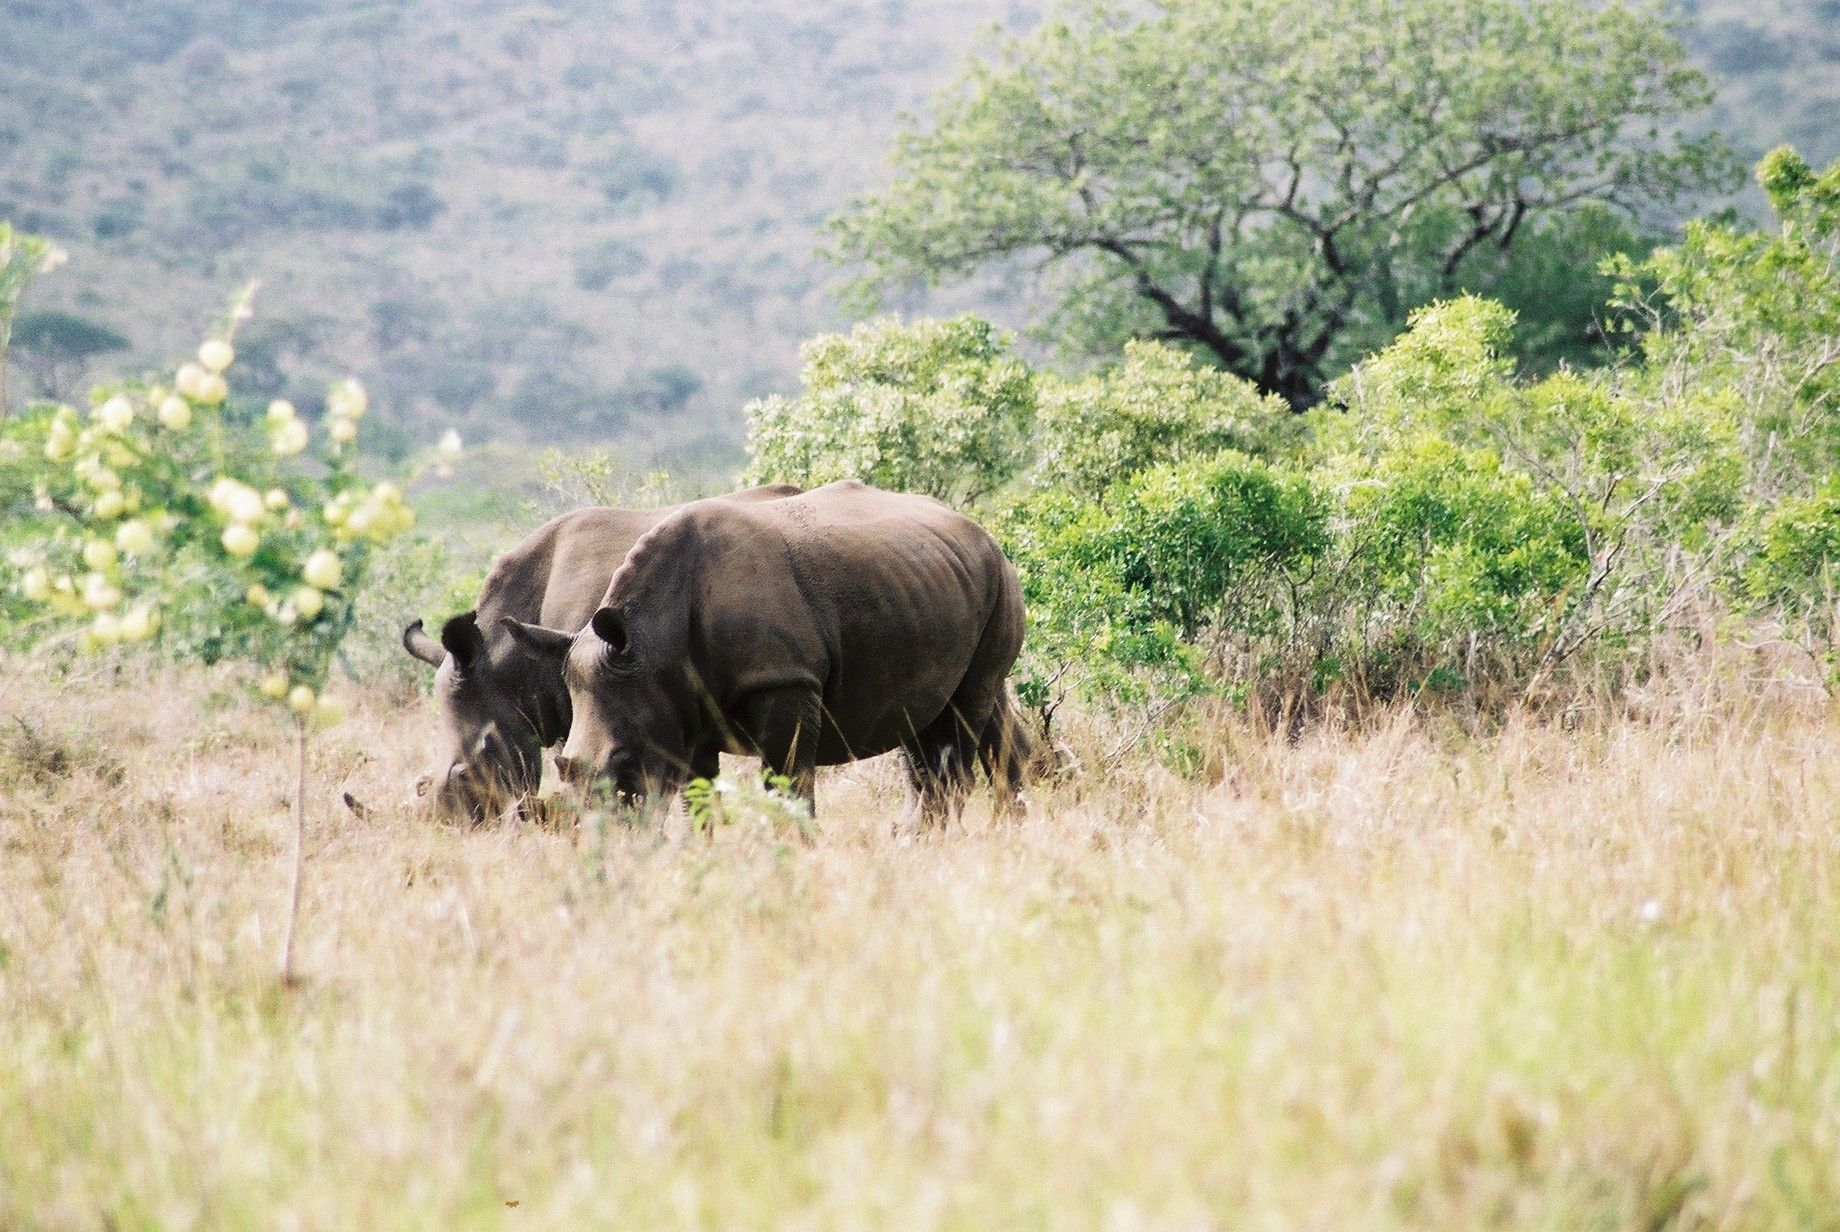 rhinoceros couple happy together